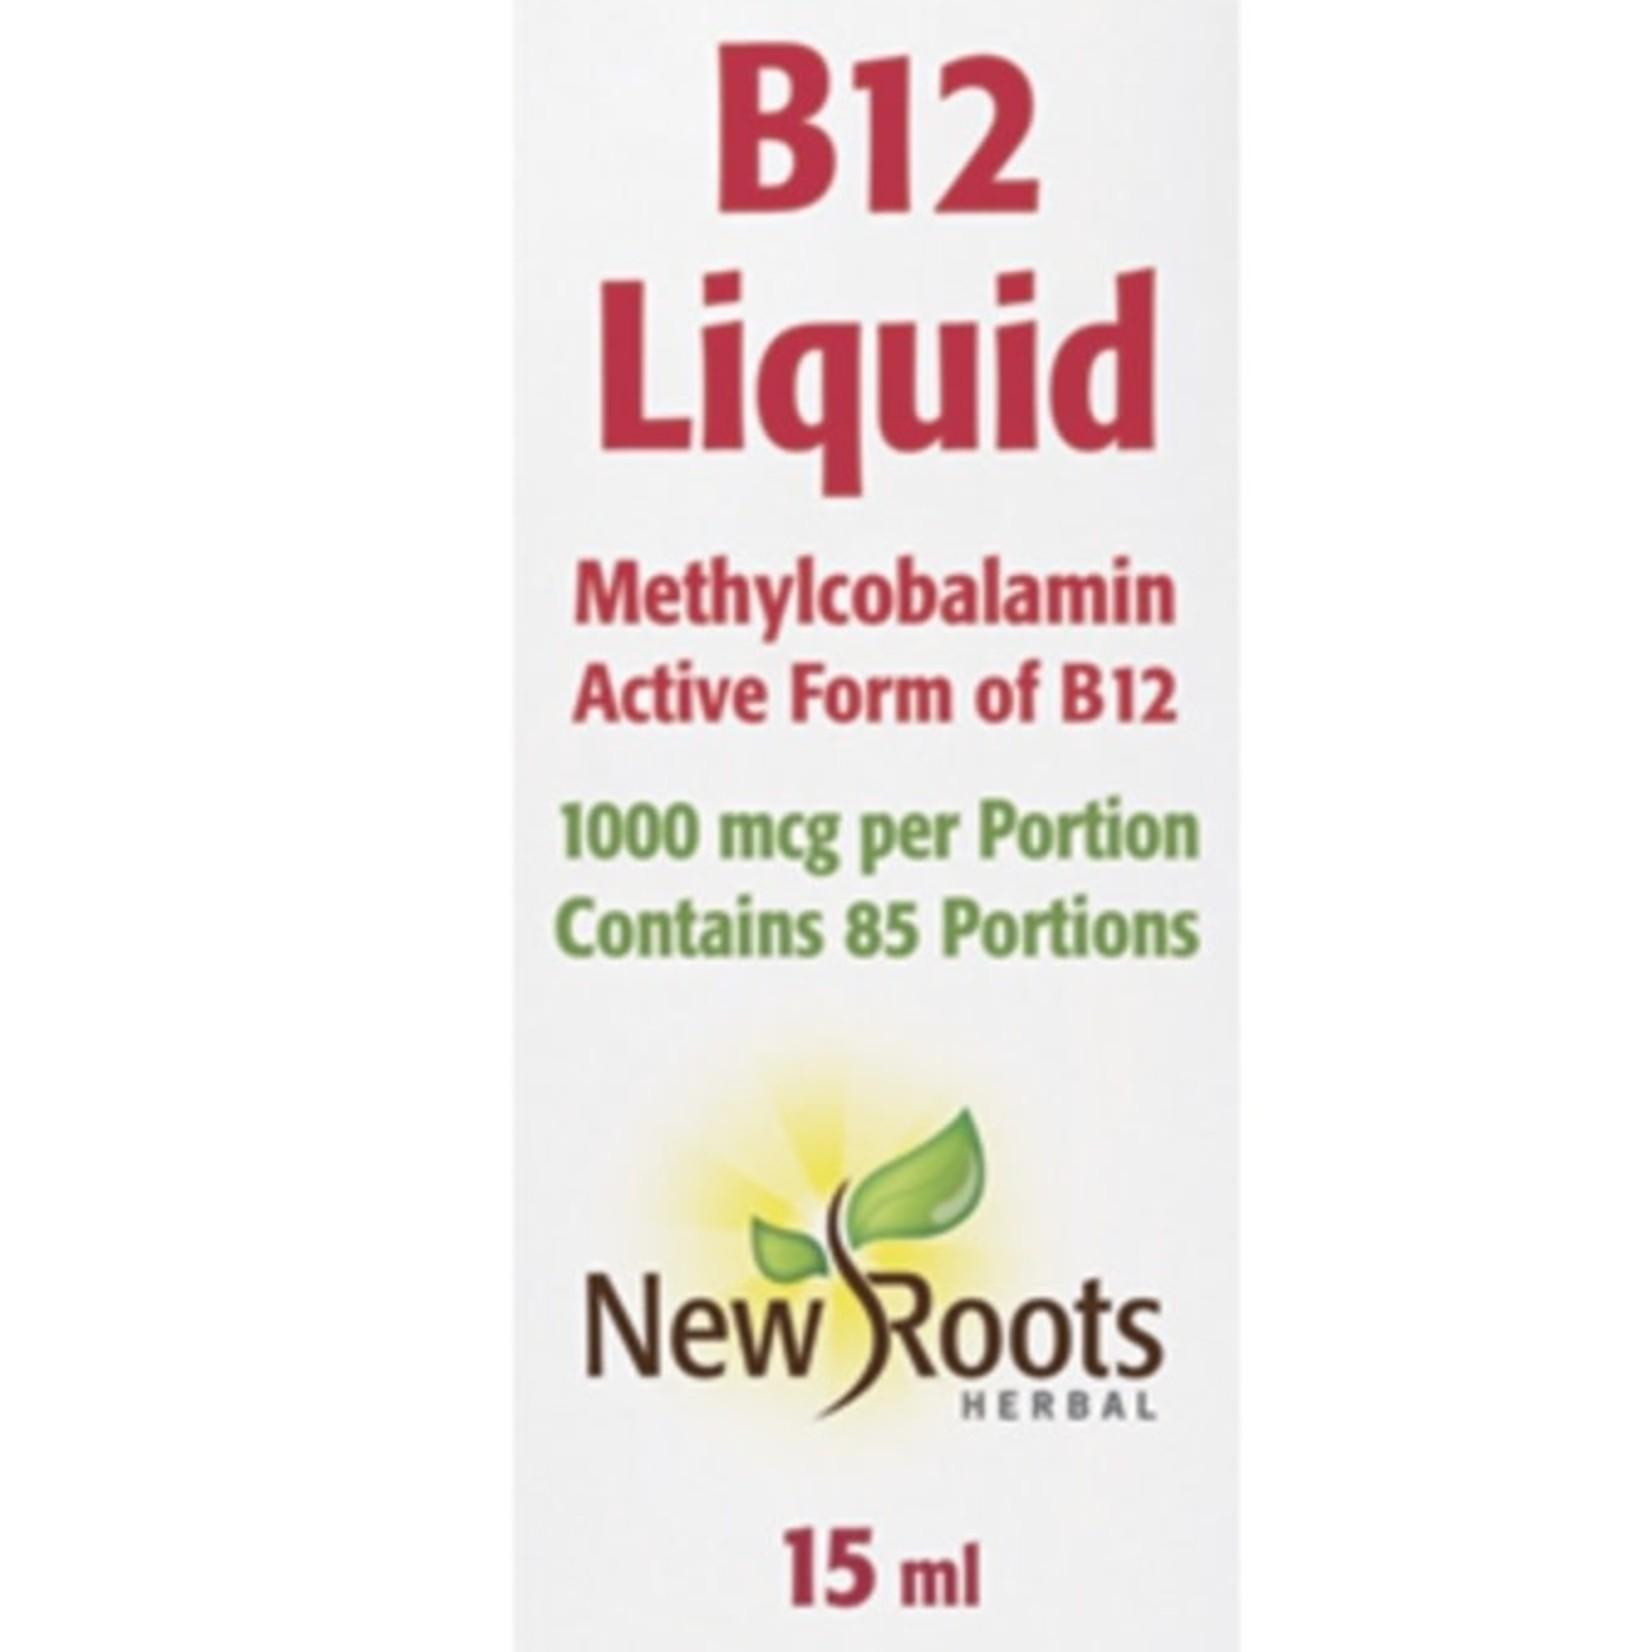 New Roots New Roots B12 Liquid 15ml